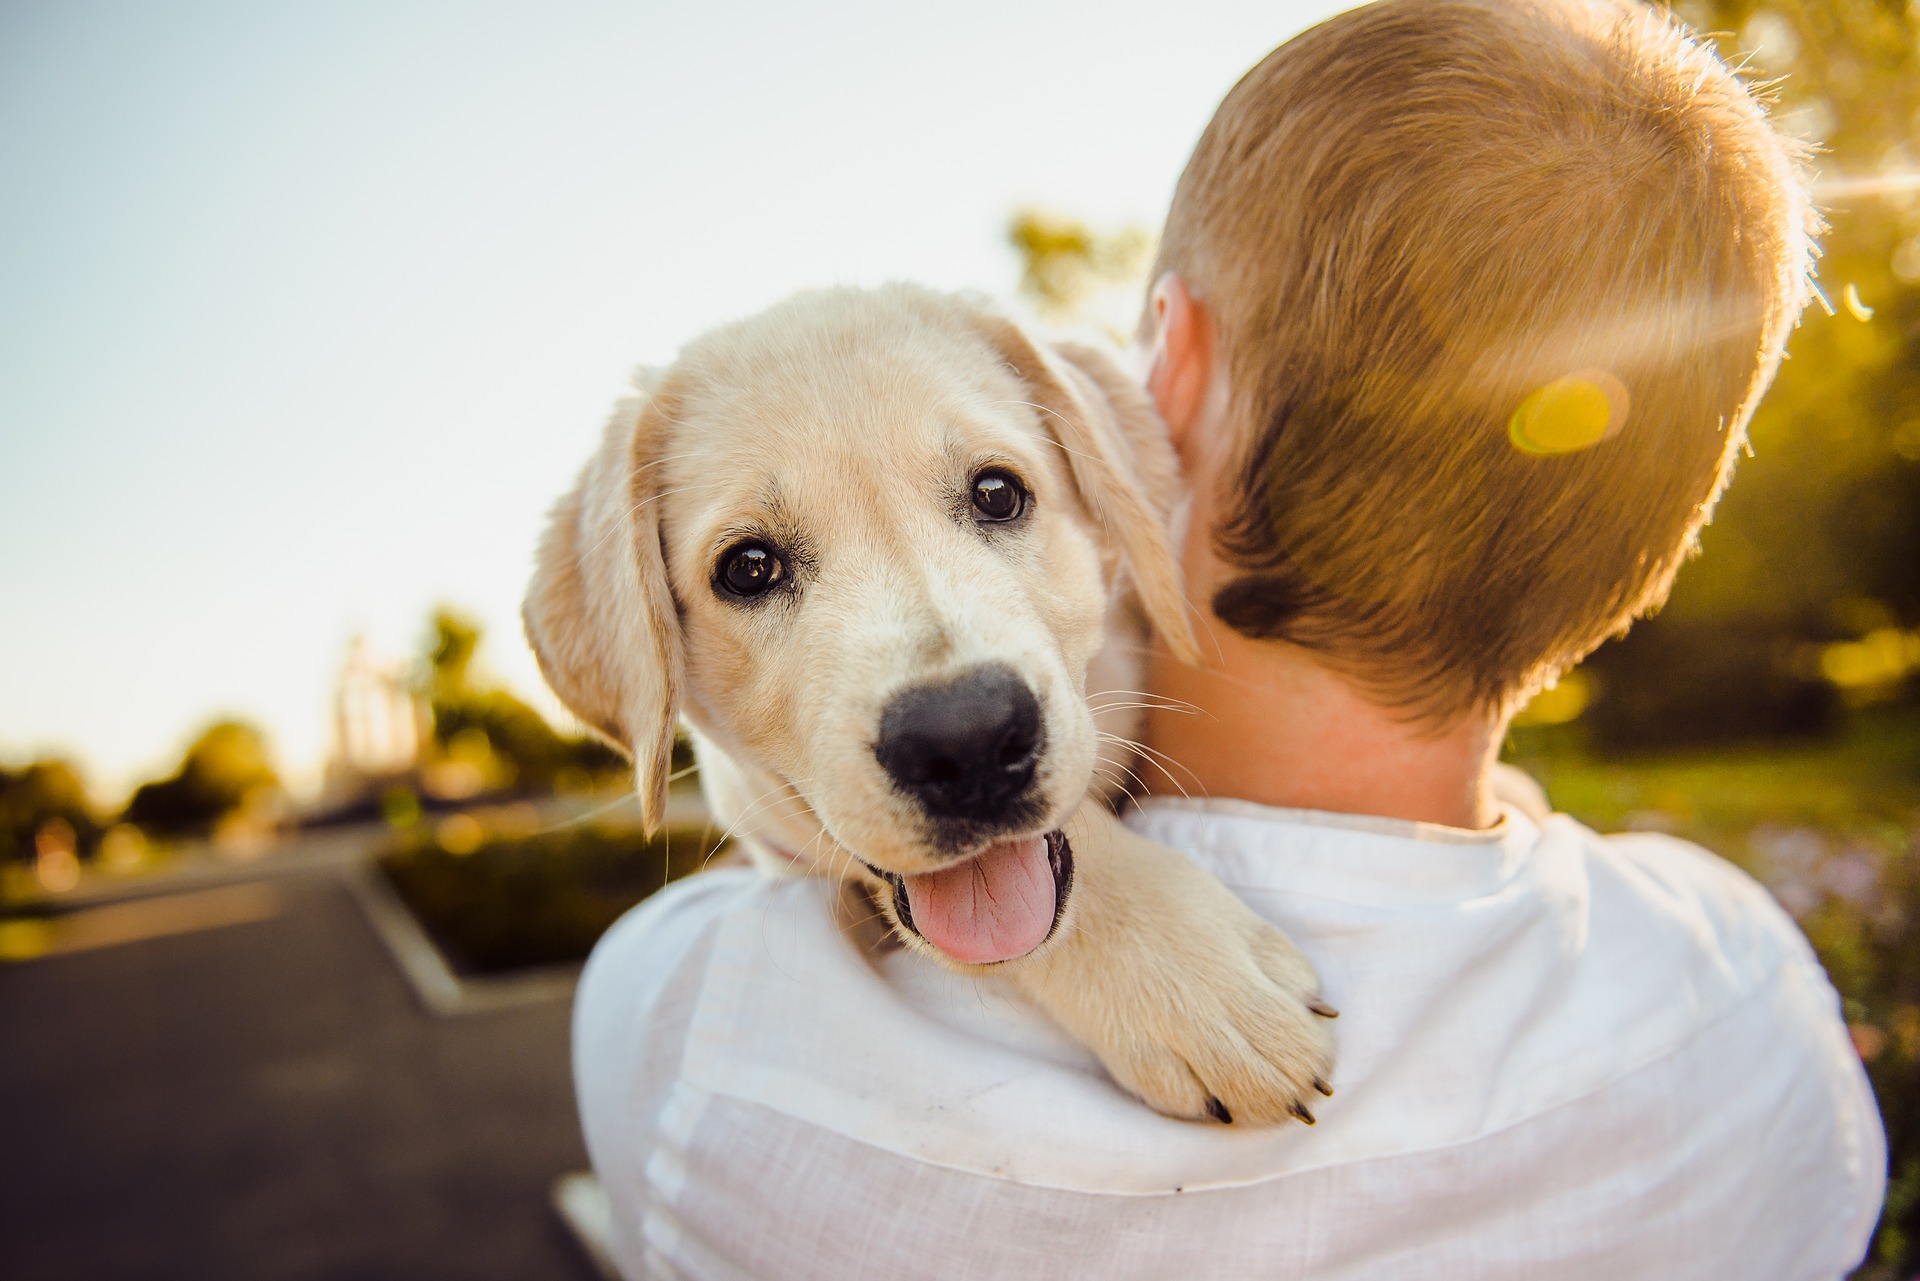 Ilustracija (ne prikazuje psa Bucka) / Image by Helena Sushitskaya from Pixabay